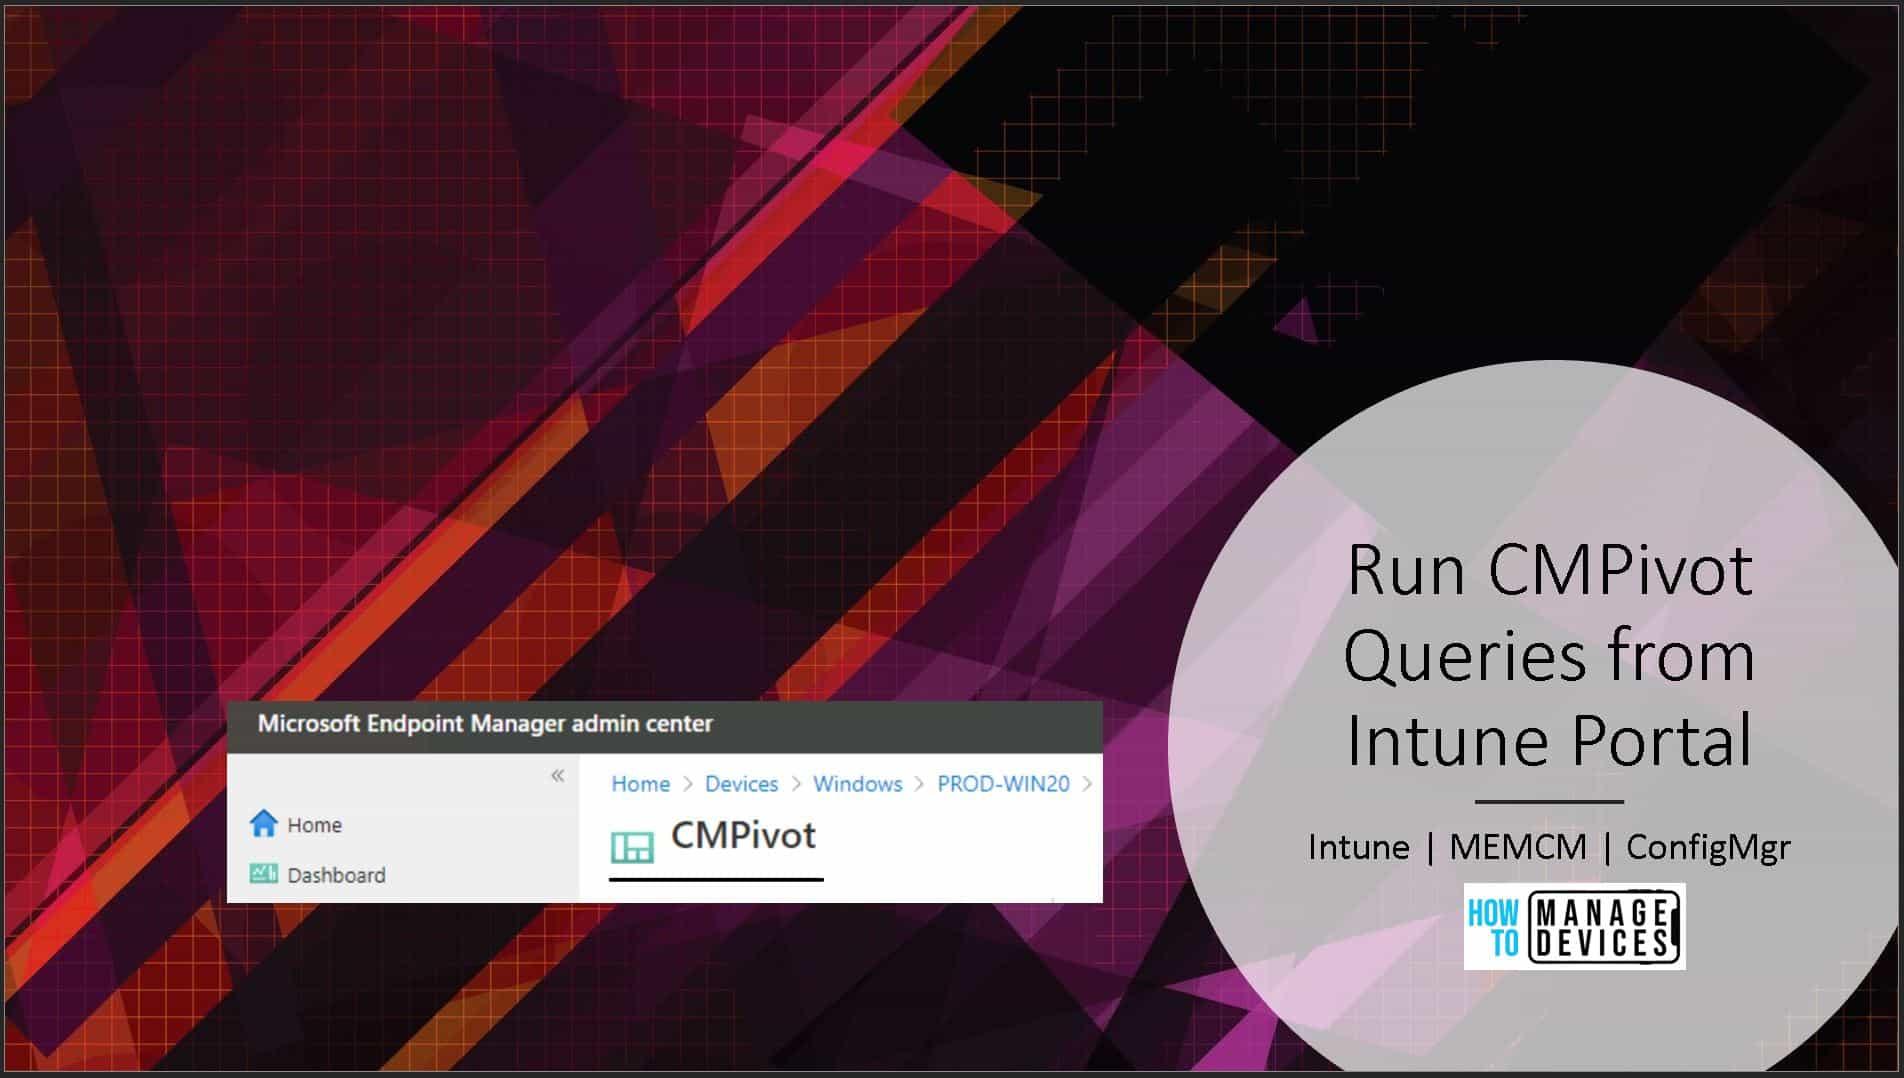 Run CMPivot Queries from Intune Portal